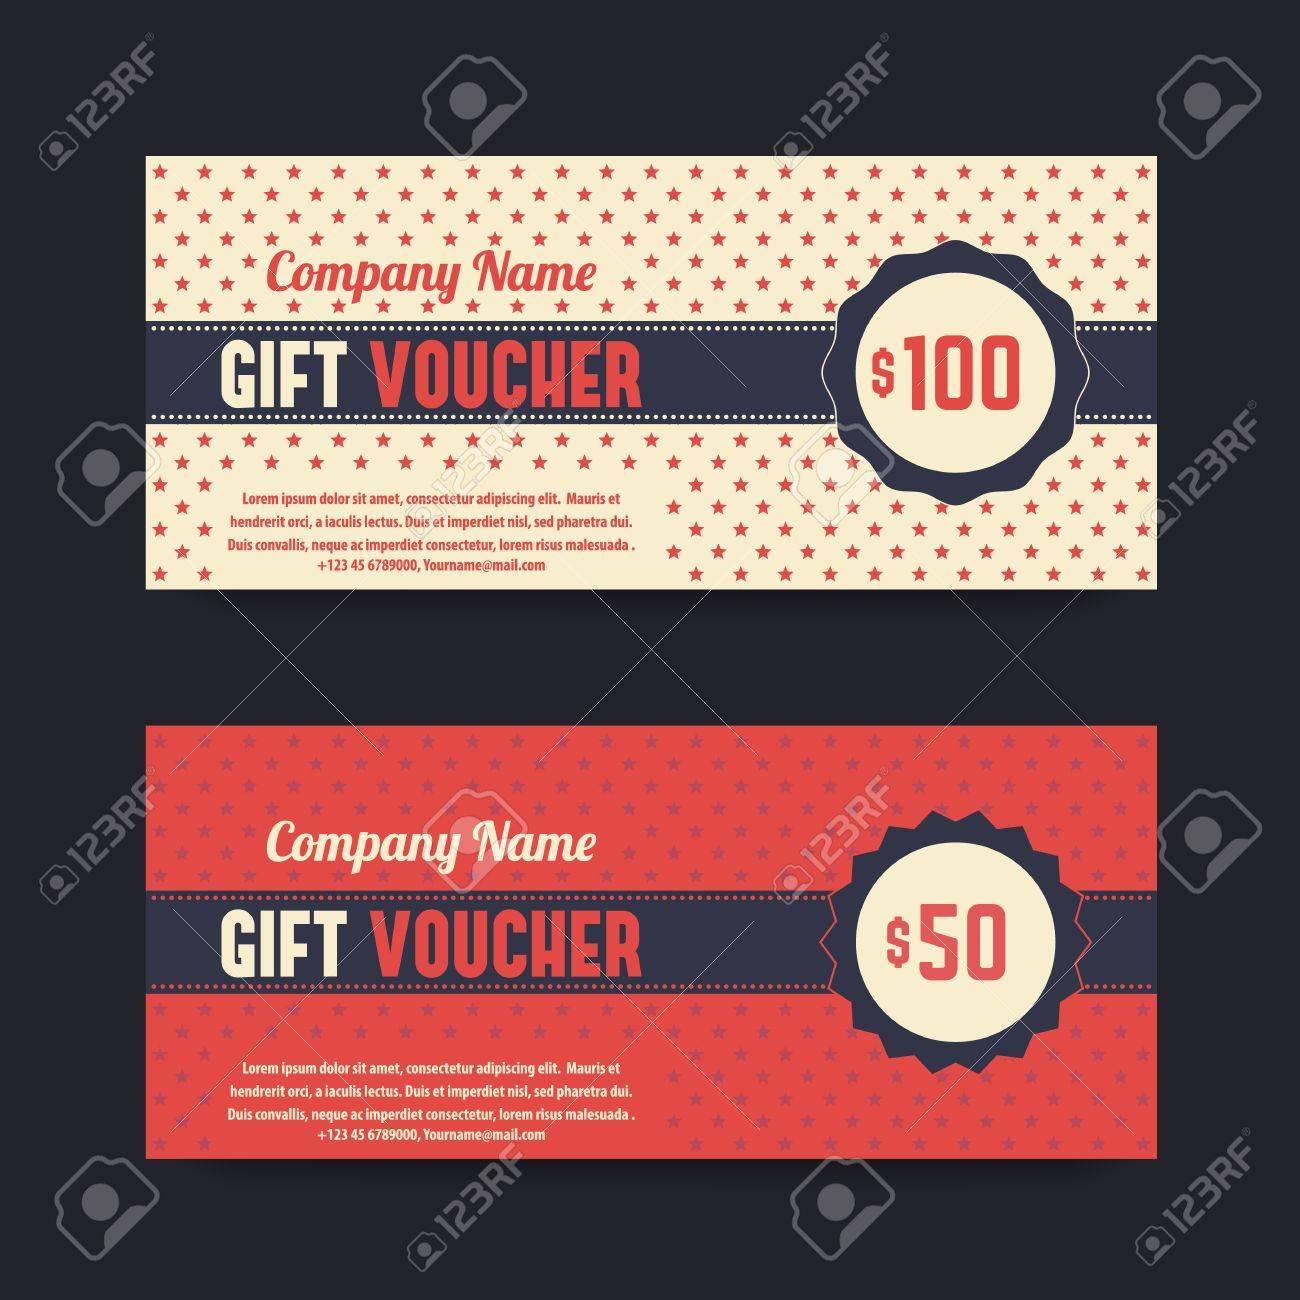 Vintage Gift Voucher Design, Templates, Vector Illustration Royalty ...